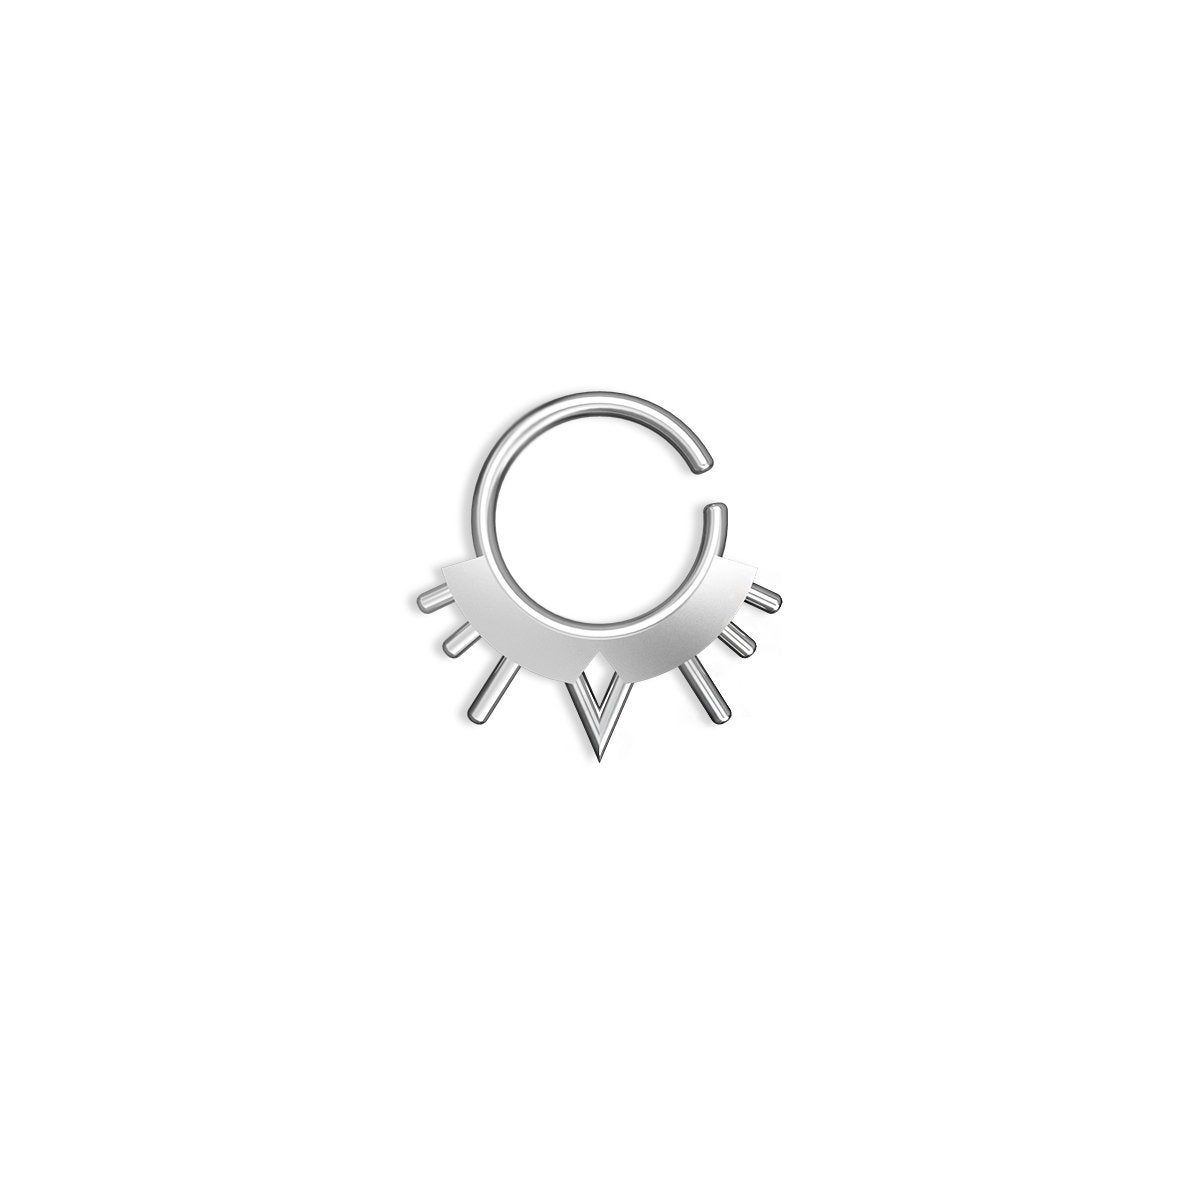 Unique septum ring , Septum , Male septum ring , Male septum , unique septum , silver septum ring , spetum , cool septum ring, Free Shipping #septums #earring #earrings #art #SeptumPiercing #CoolSeptum #psychedelic #septum #SeptumEarring #jewelry